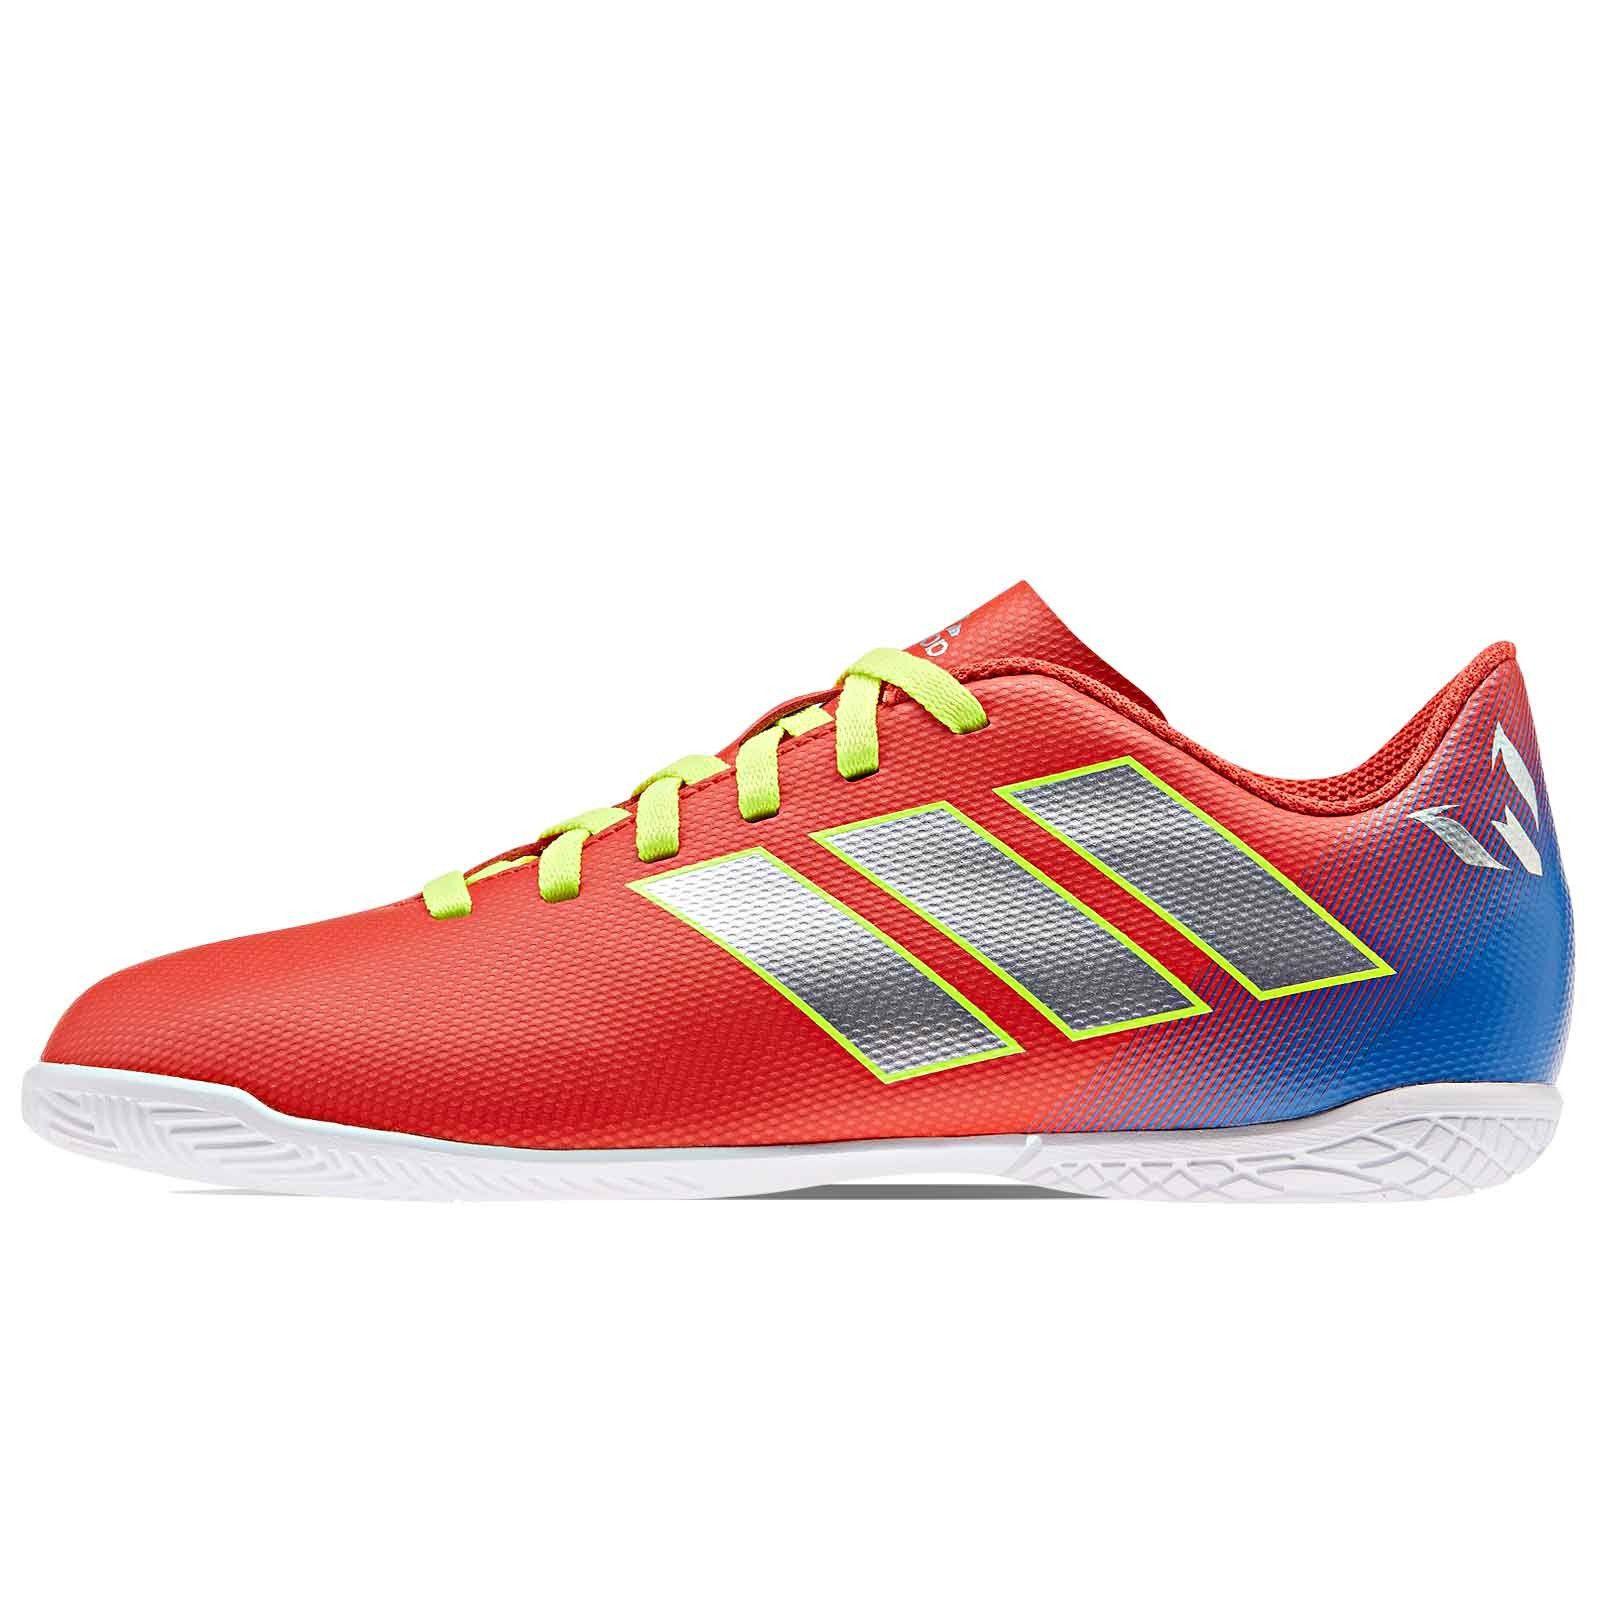 fce47331527 Chuteira Adidas Nemeziz Messi Tango 18.4 IN Jr Futsal